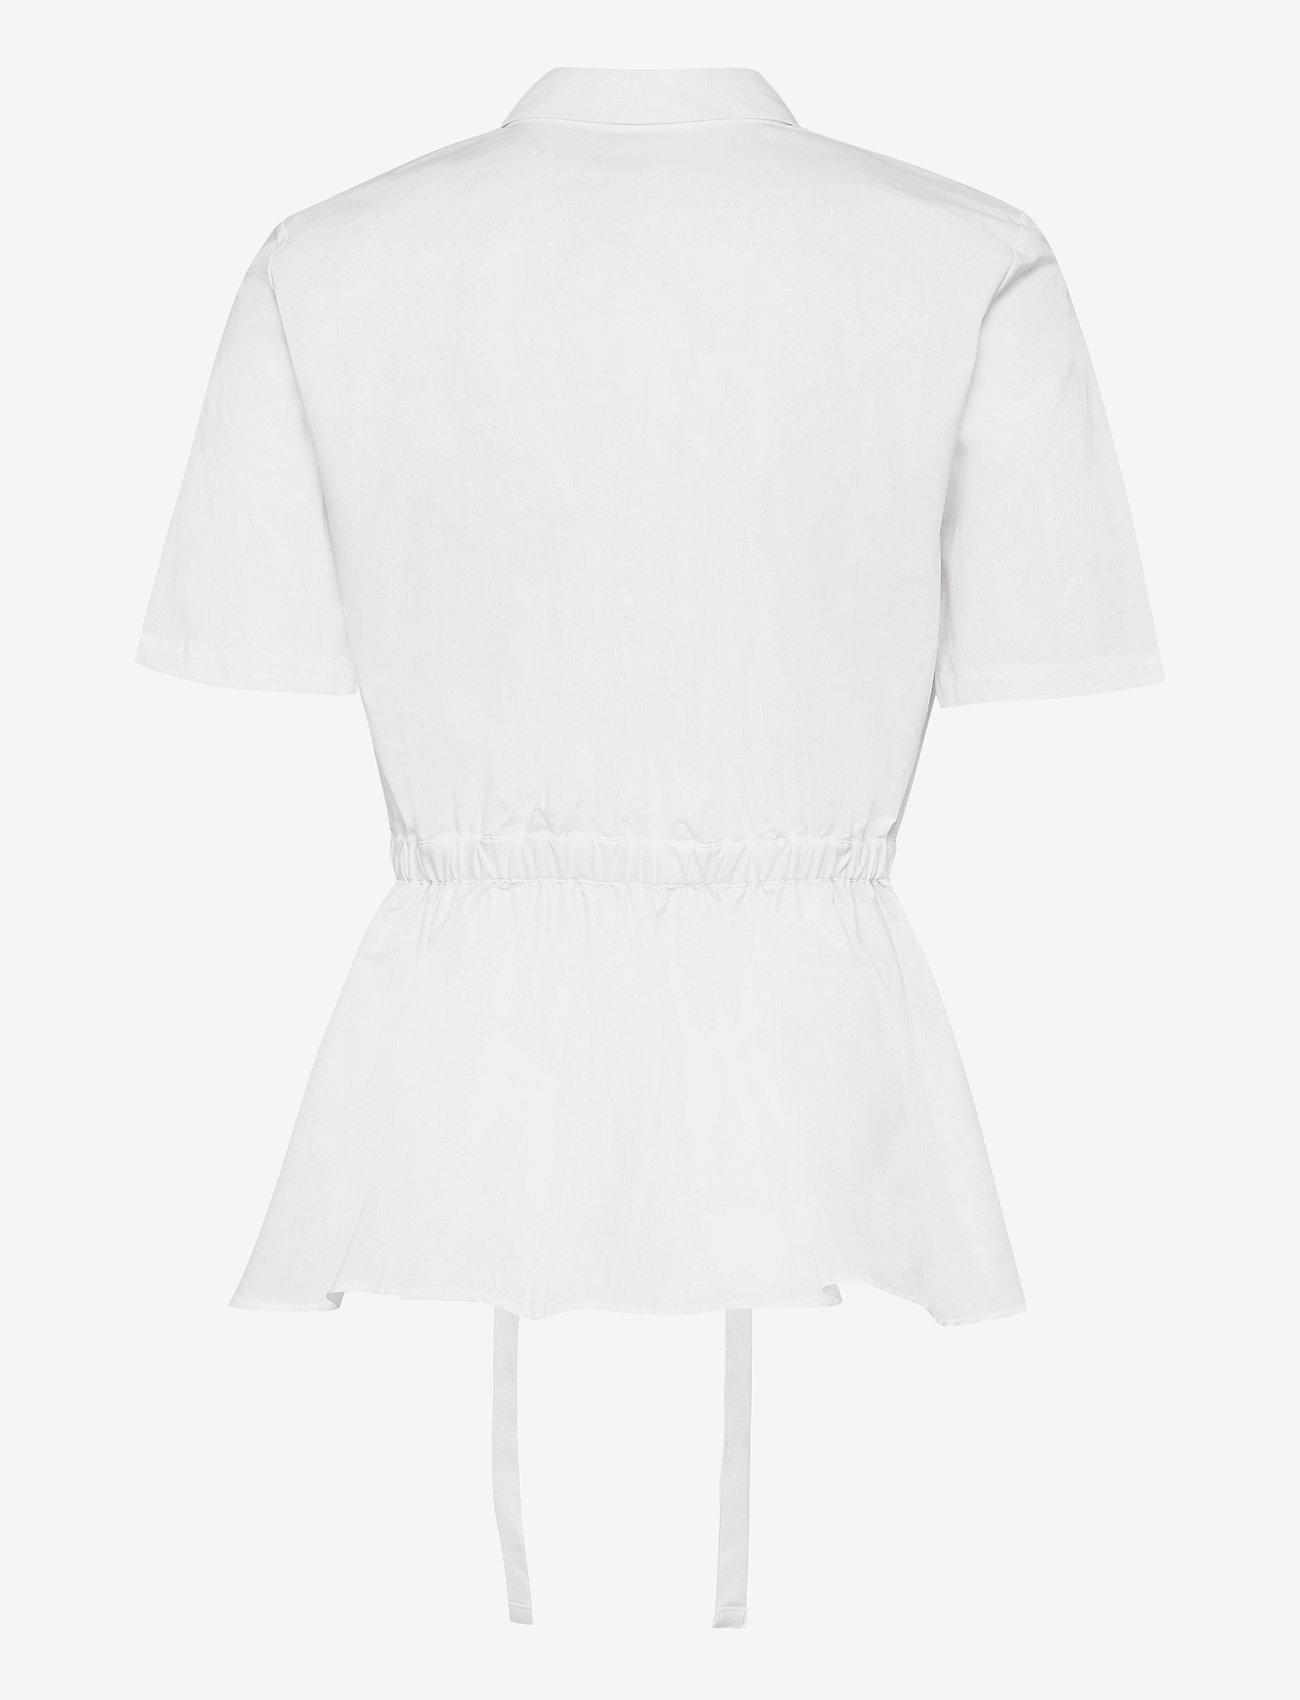 HUGO - Ezina - blouses à manches courtes - white - 1